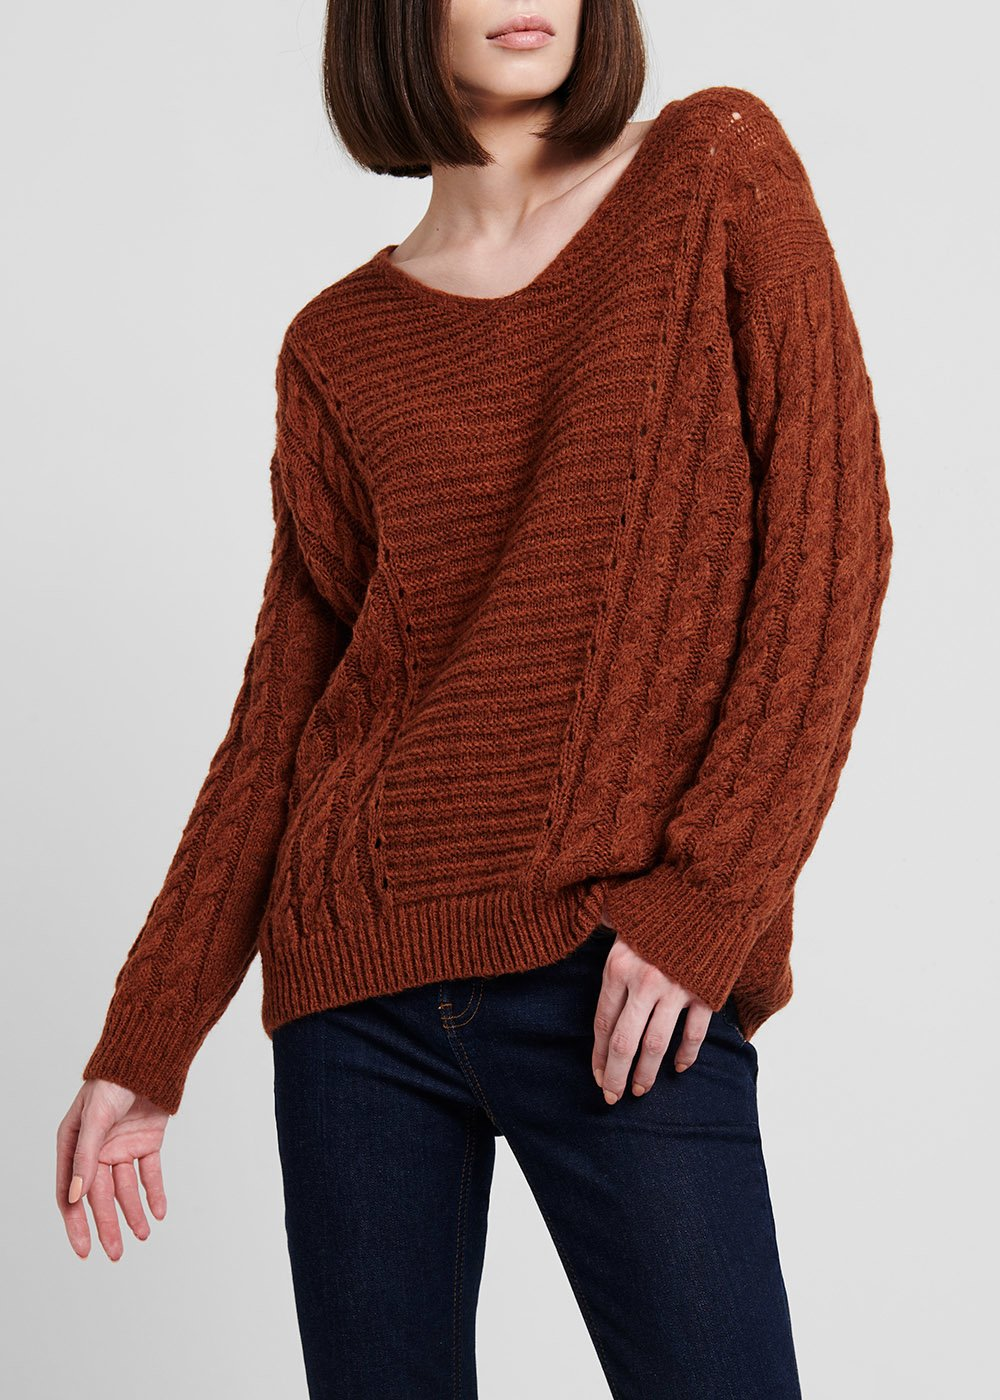 Rust - coloured wool sweater - Ruggine - Woman